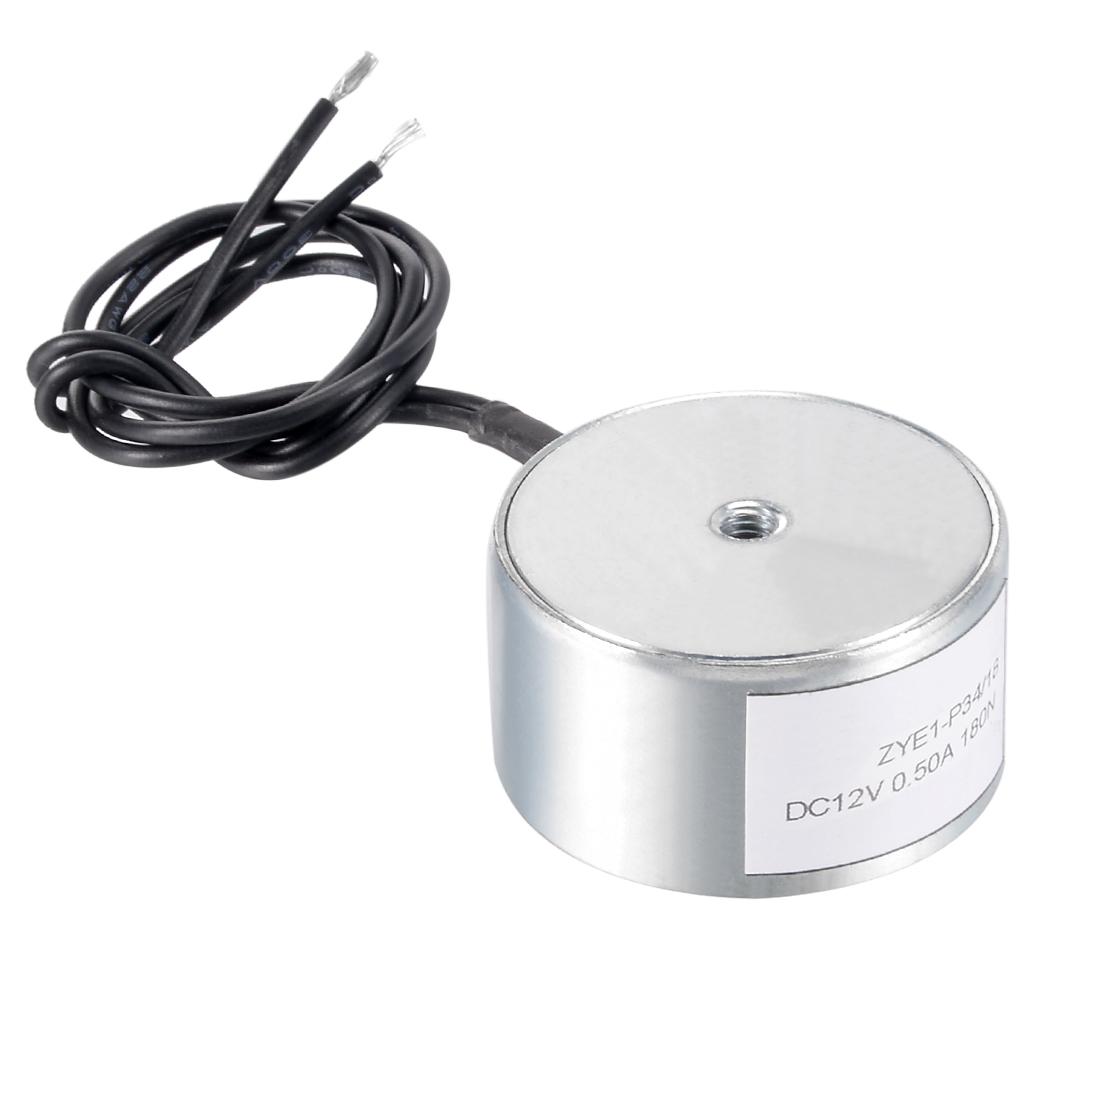 34mm x 18mm DC12V 0.5A 180N Sucking Disc Solenoid Lift Holding Electromagnet